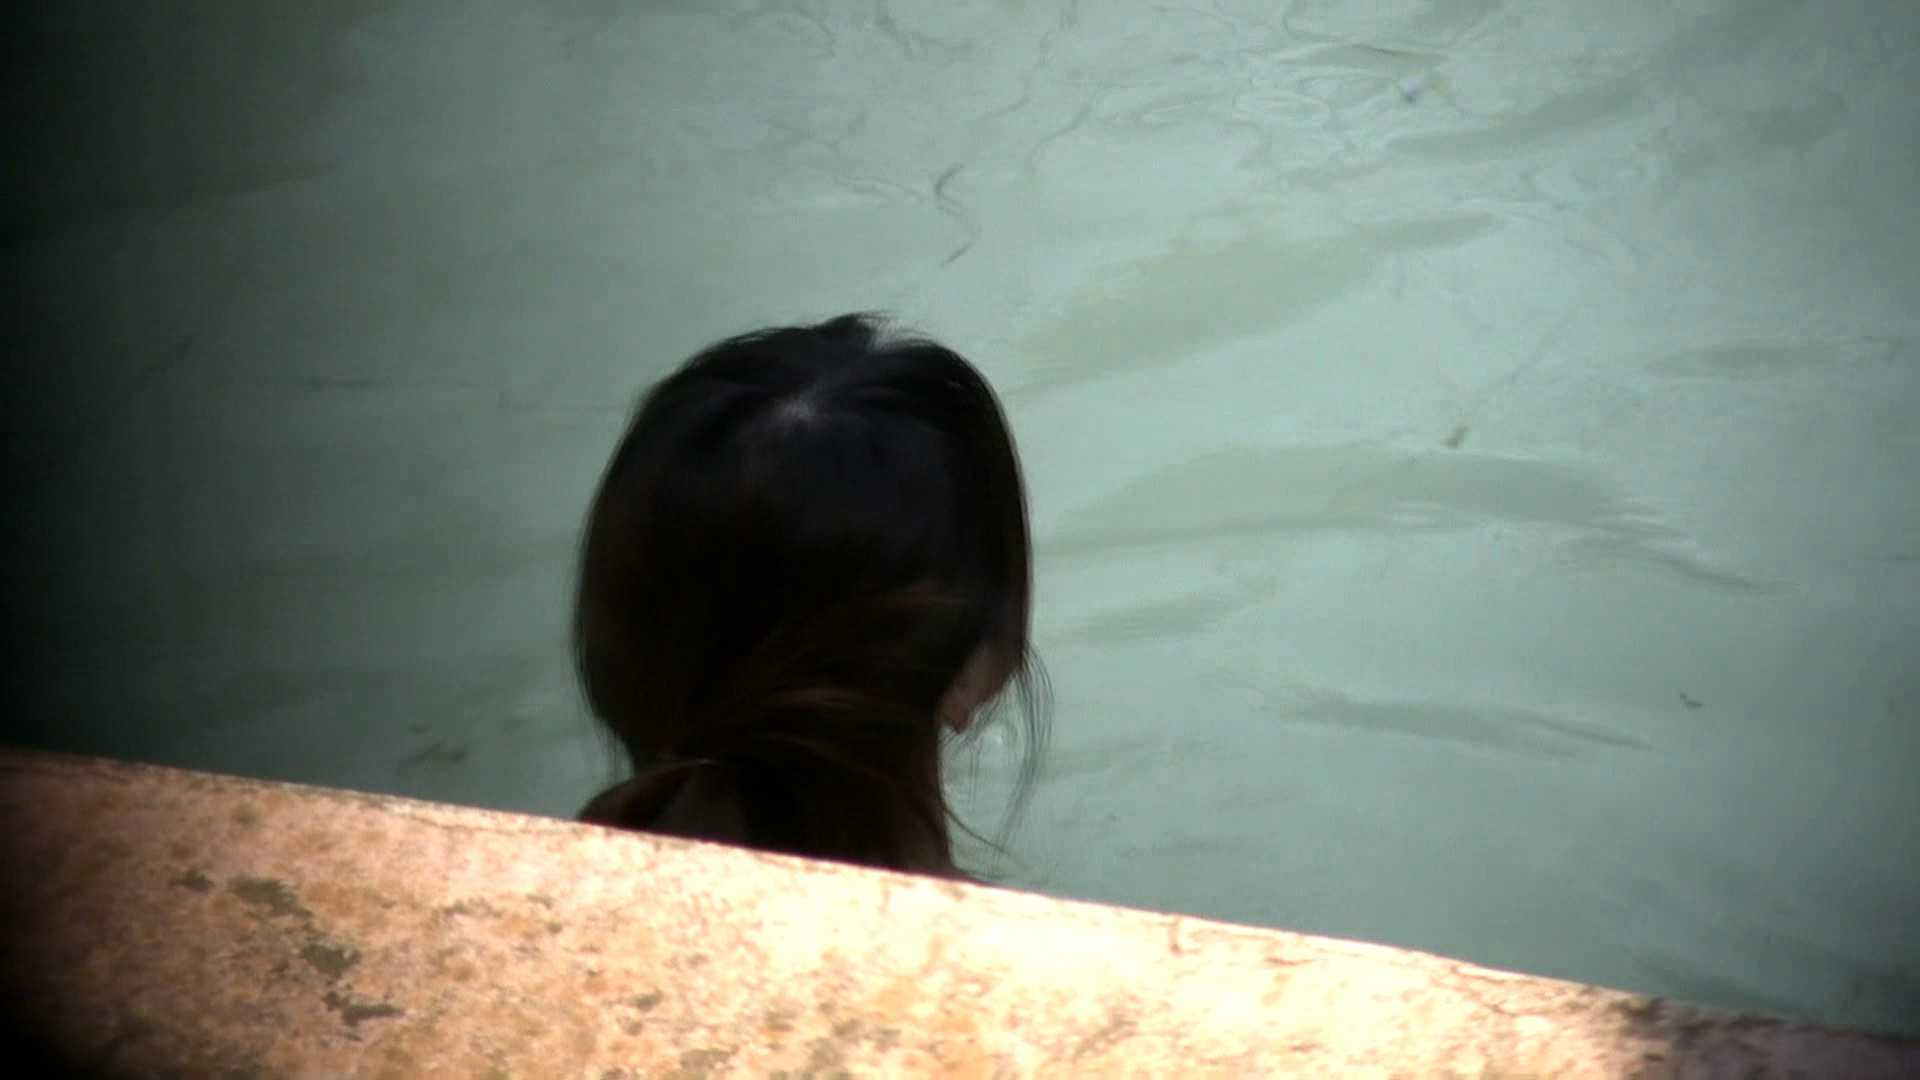 Aquaな露天風呂Vol.652 盗撮 | HなOL  105pic 104